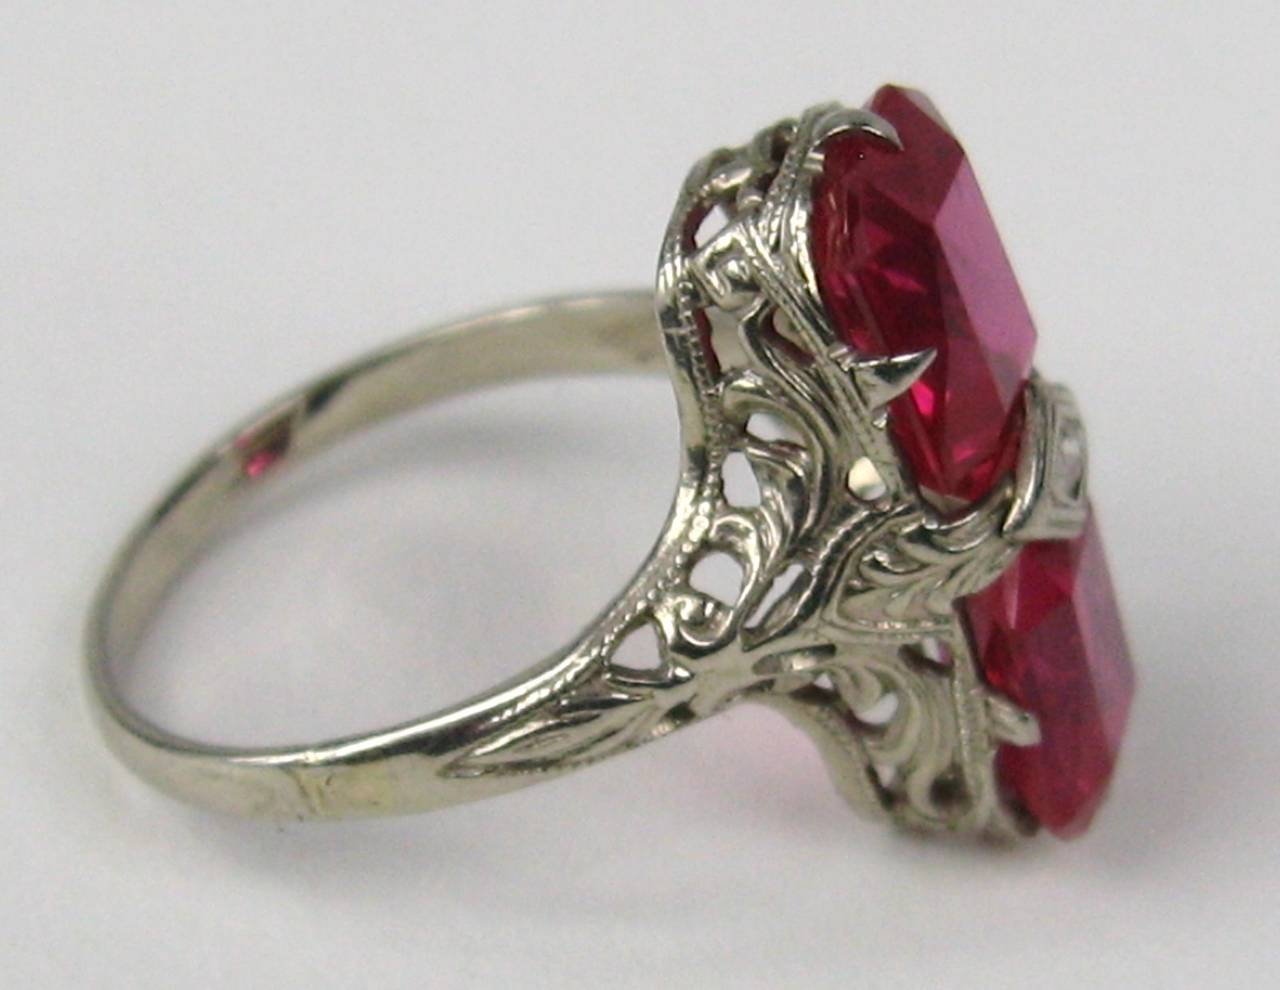 1920s white gold filigree ring for sale at 1stdibs